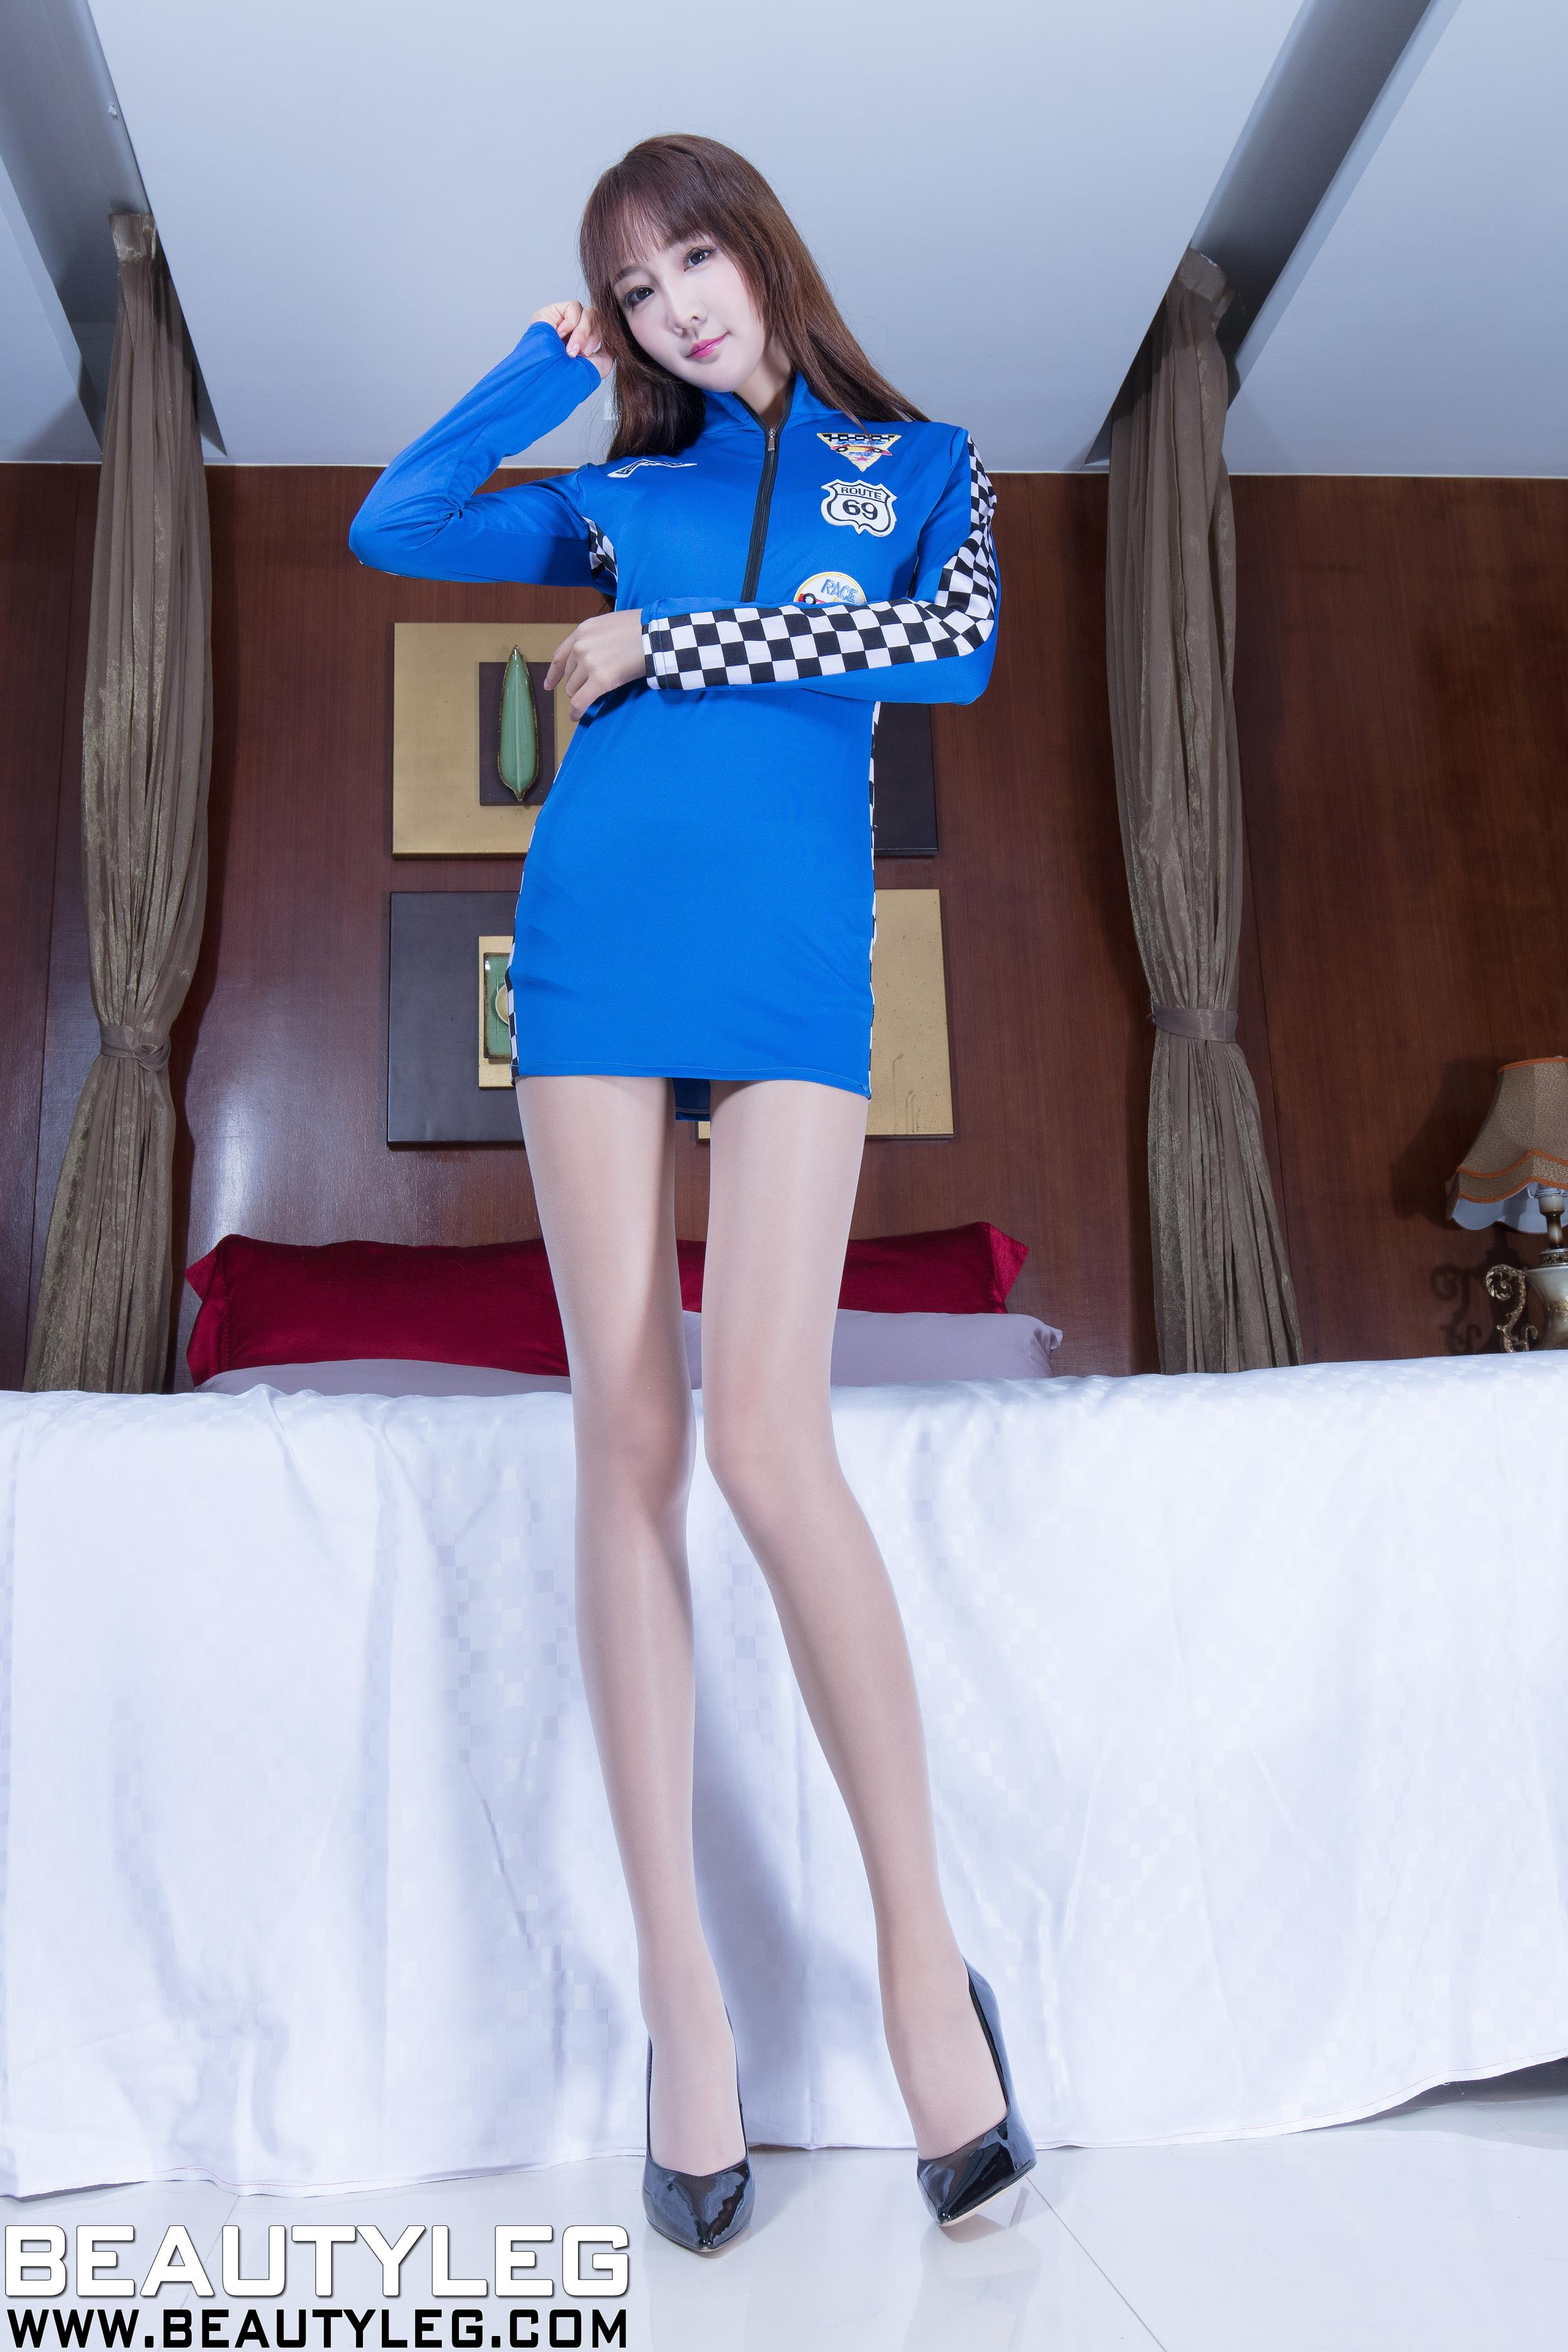 [beautyleg美腿写真]No.1614 Iris 蓝色赛车女郎制服加肉色丝袜美腿性感私房写真集